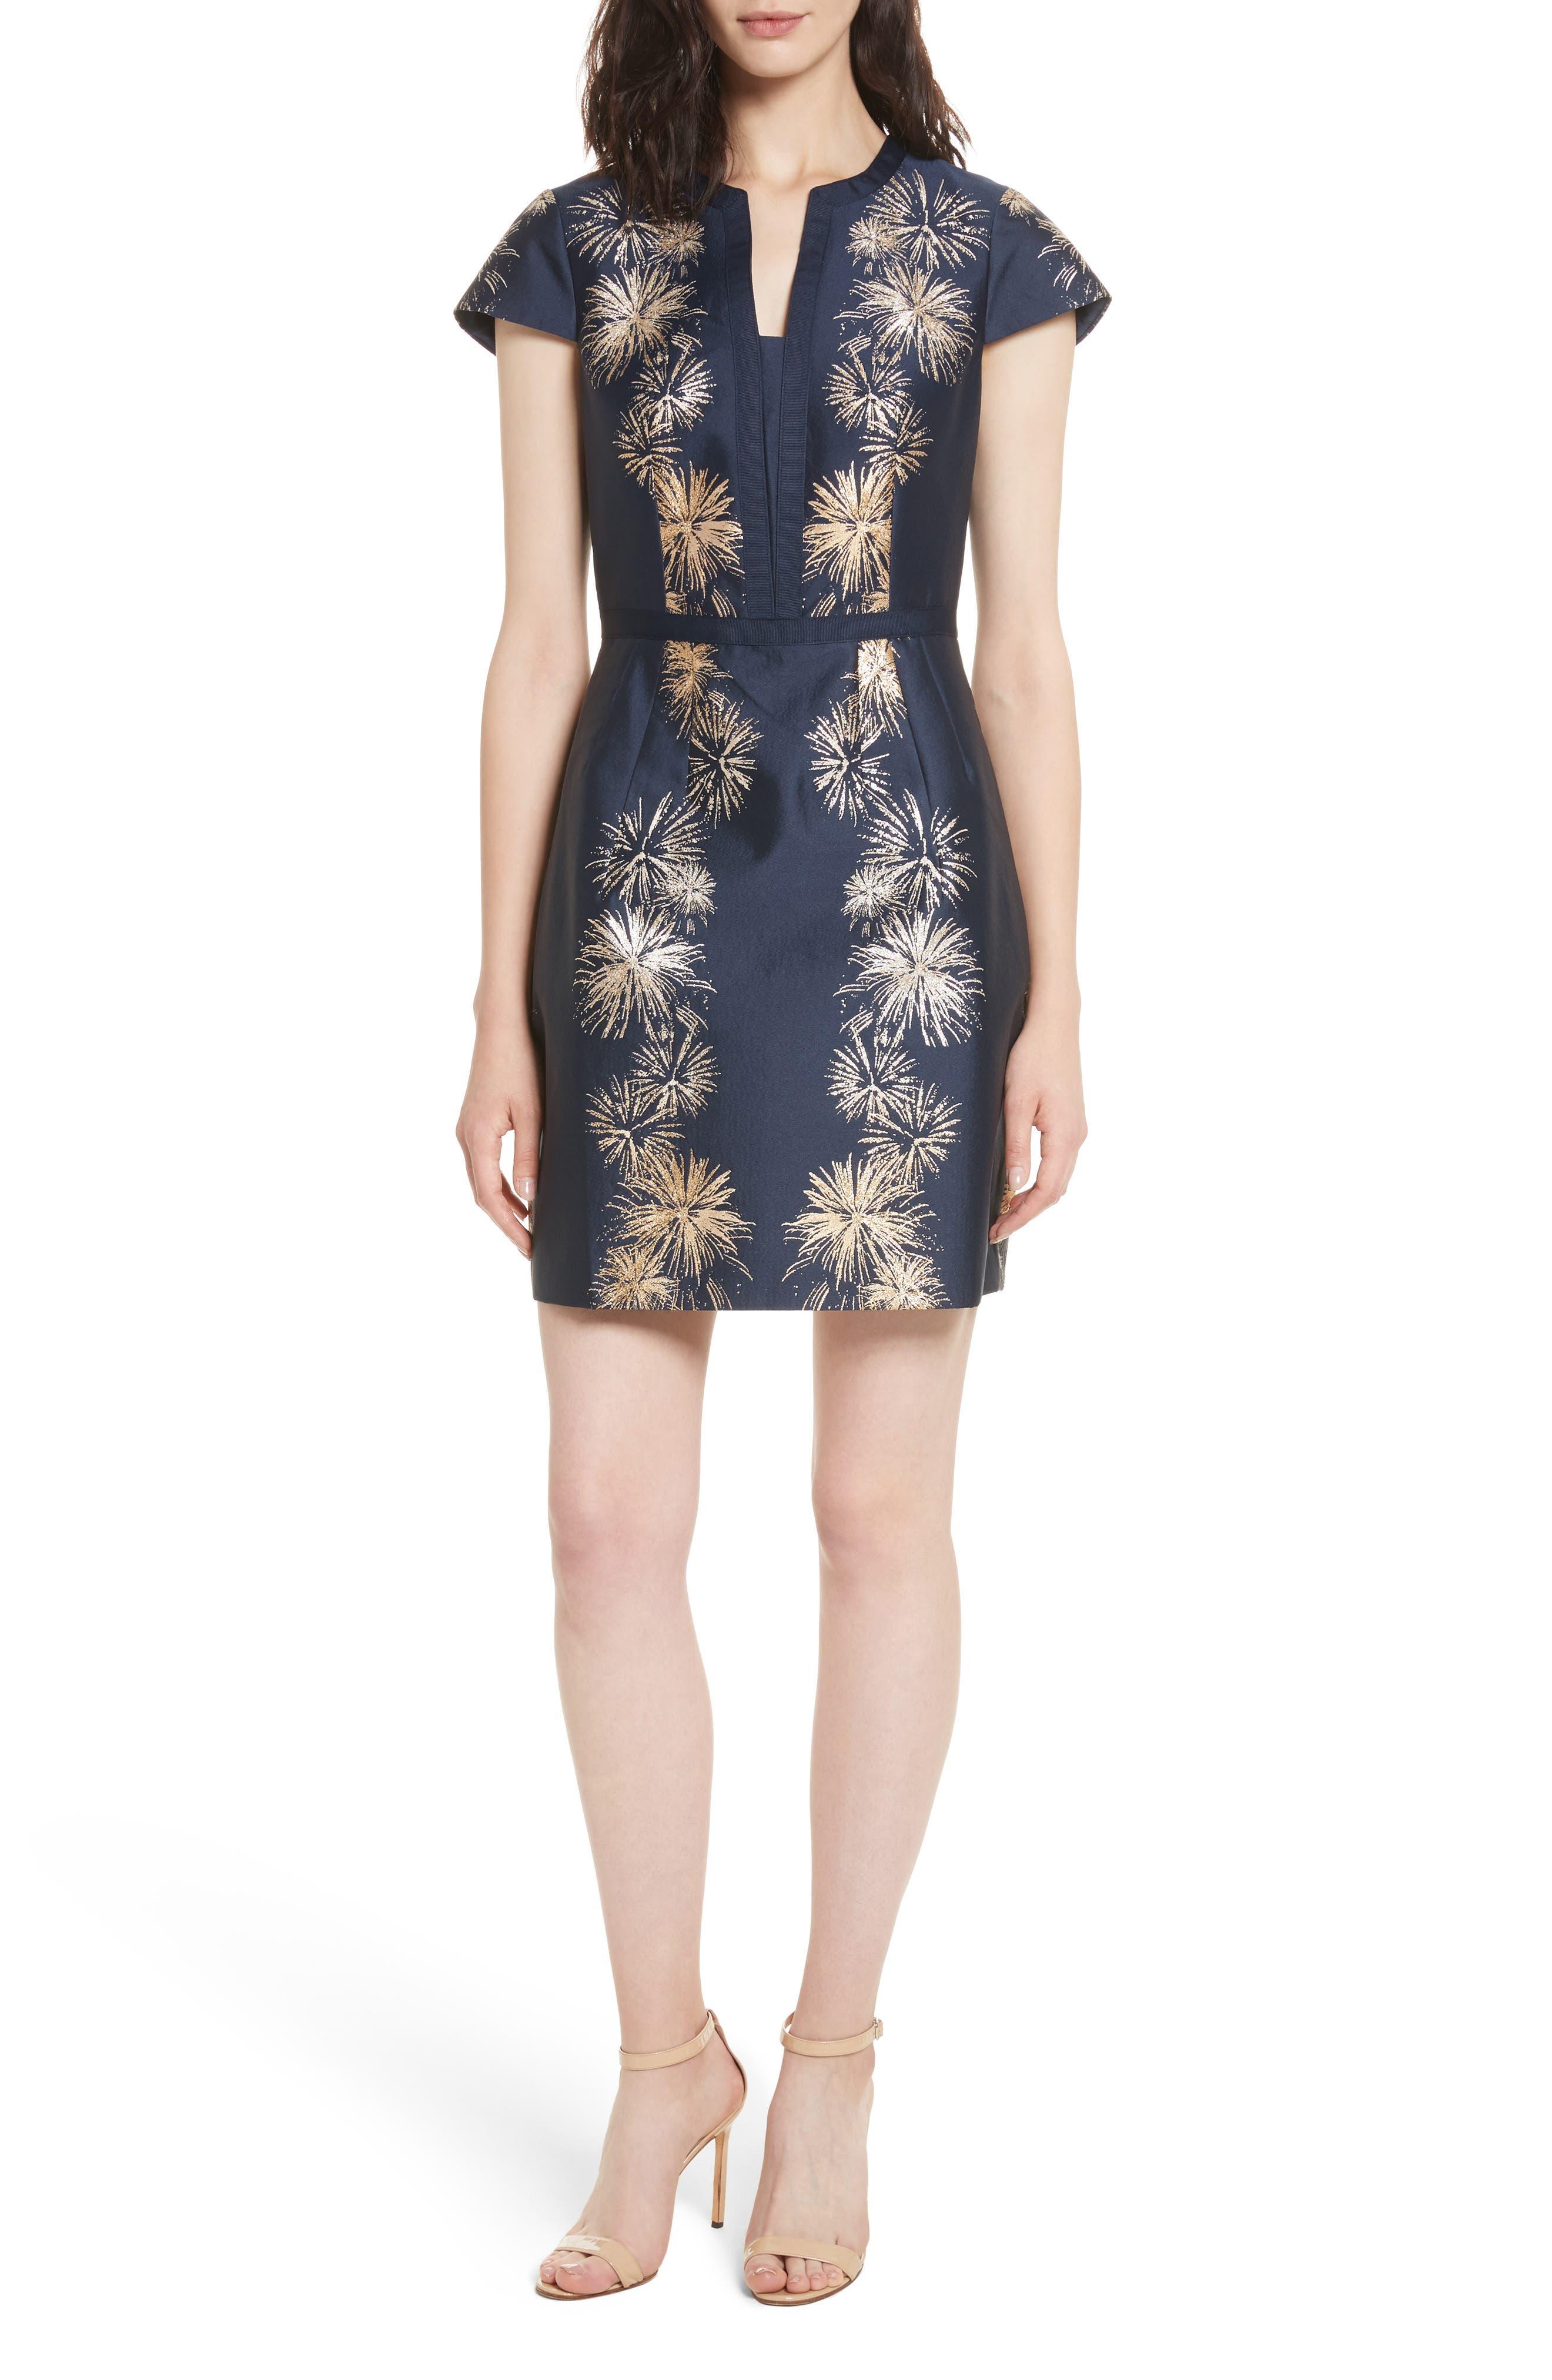 Tzalla Sculpted Stardust Jacquard Dress,                             Main thumbnail 1, color,                             402